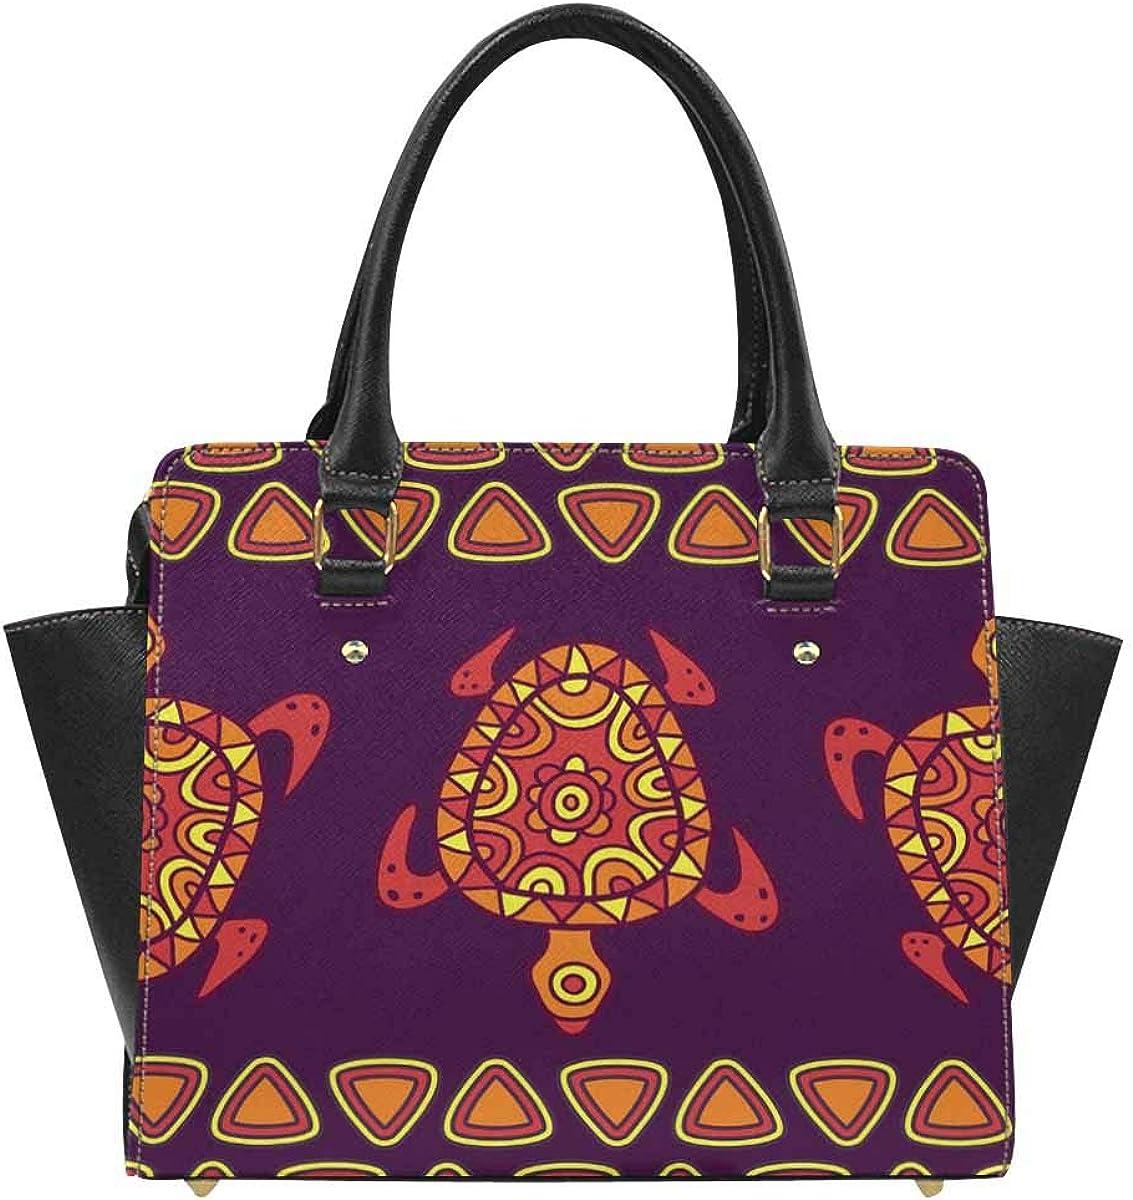 African Art Tribal Print Womens Fashion Large Shoulder Bag Handbag Tote Purse for Lady